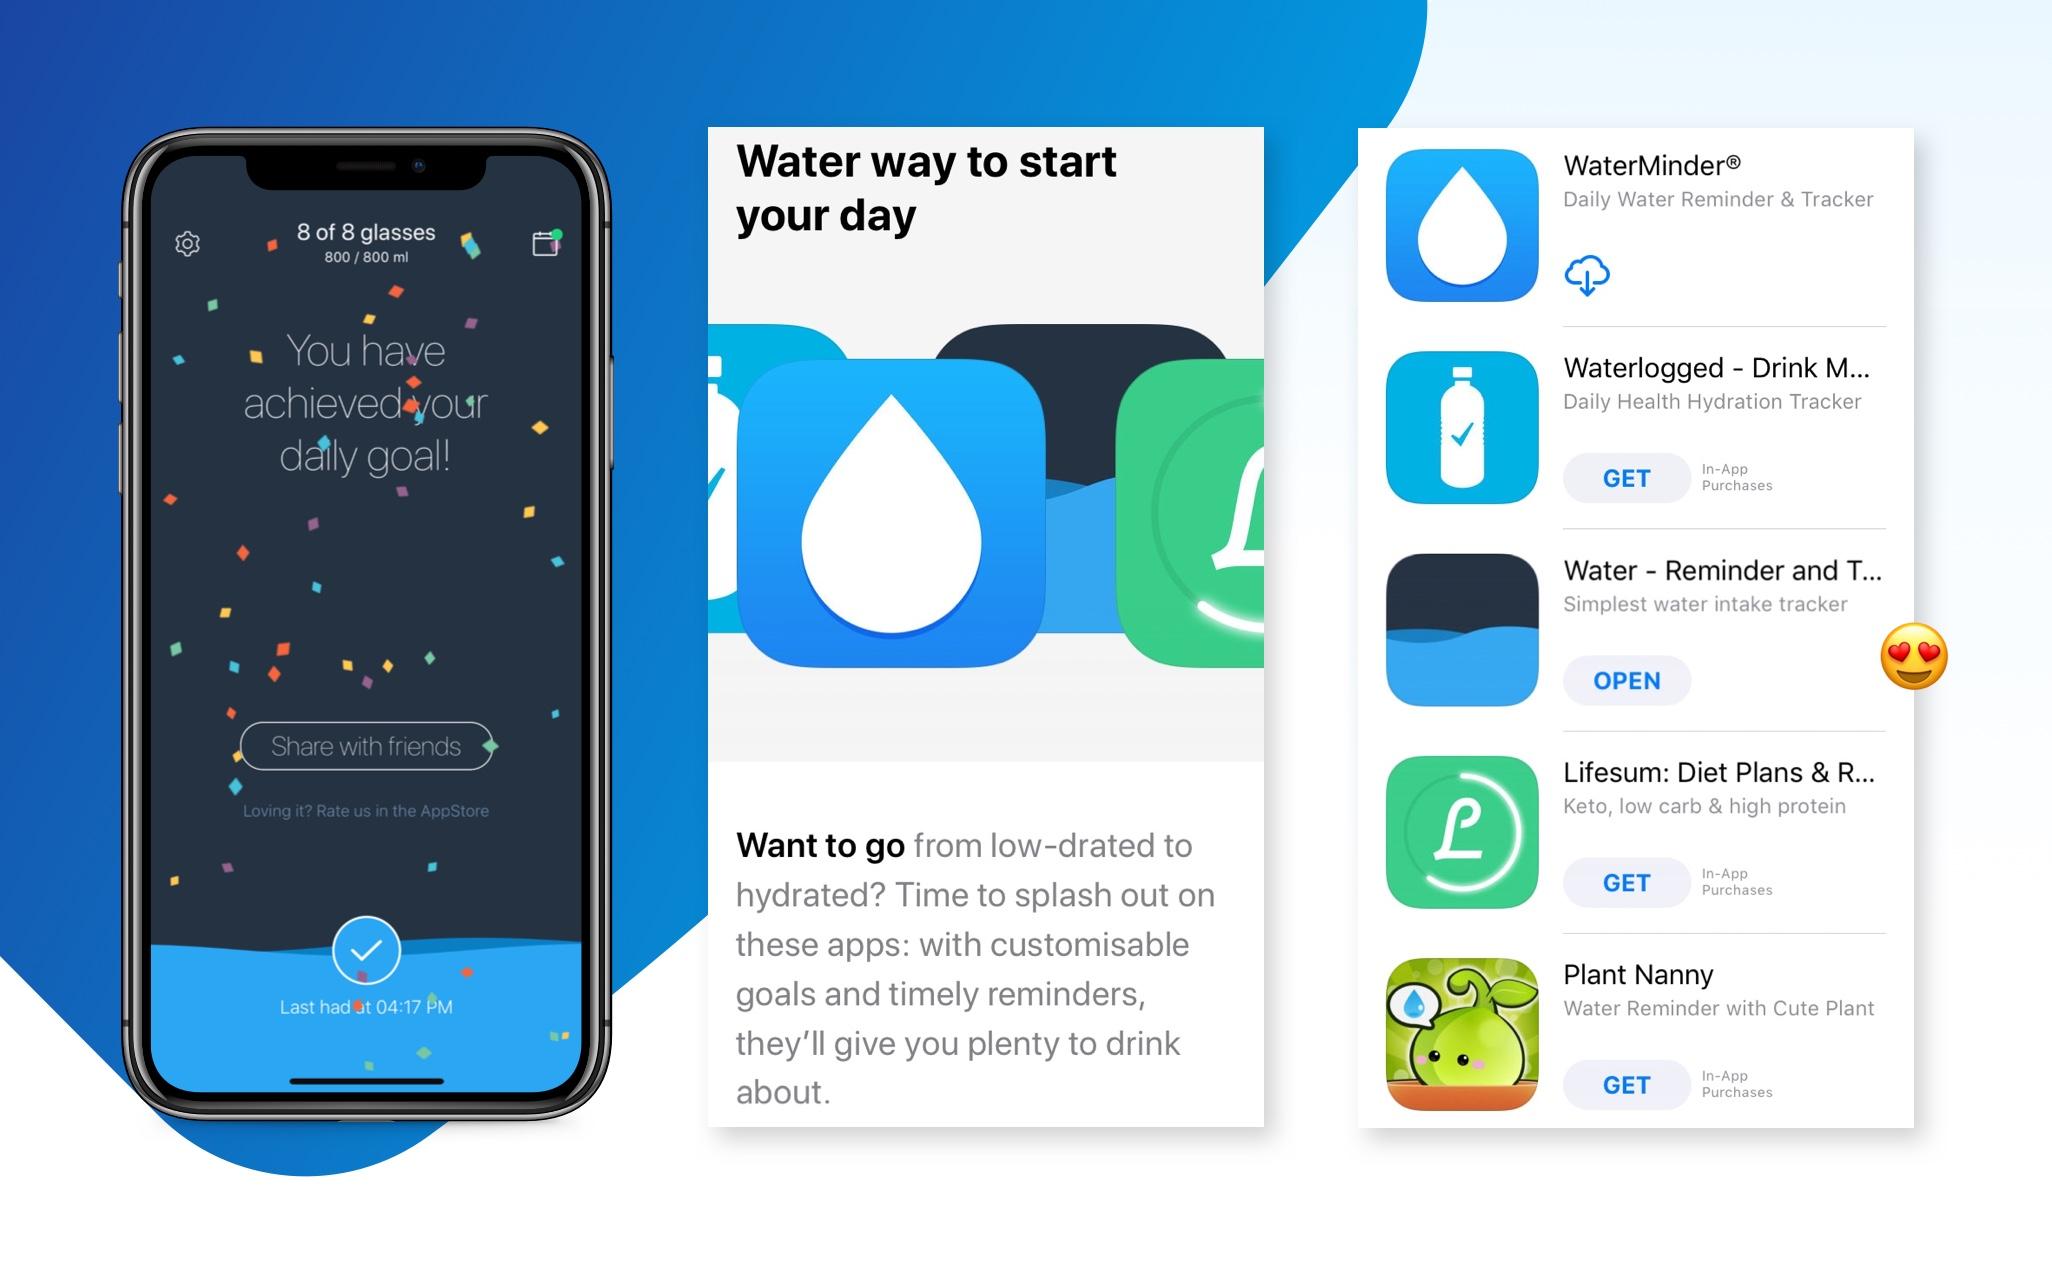 Water - App Store Feature@1x.jpg